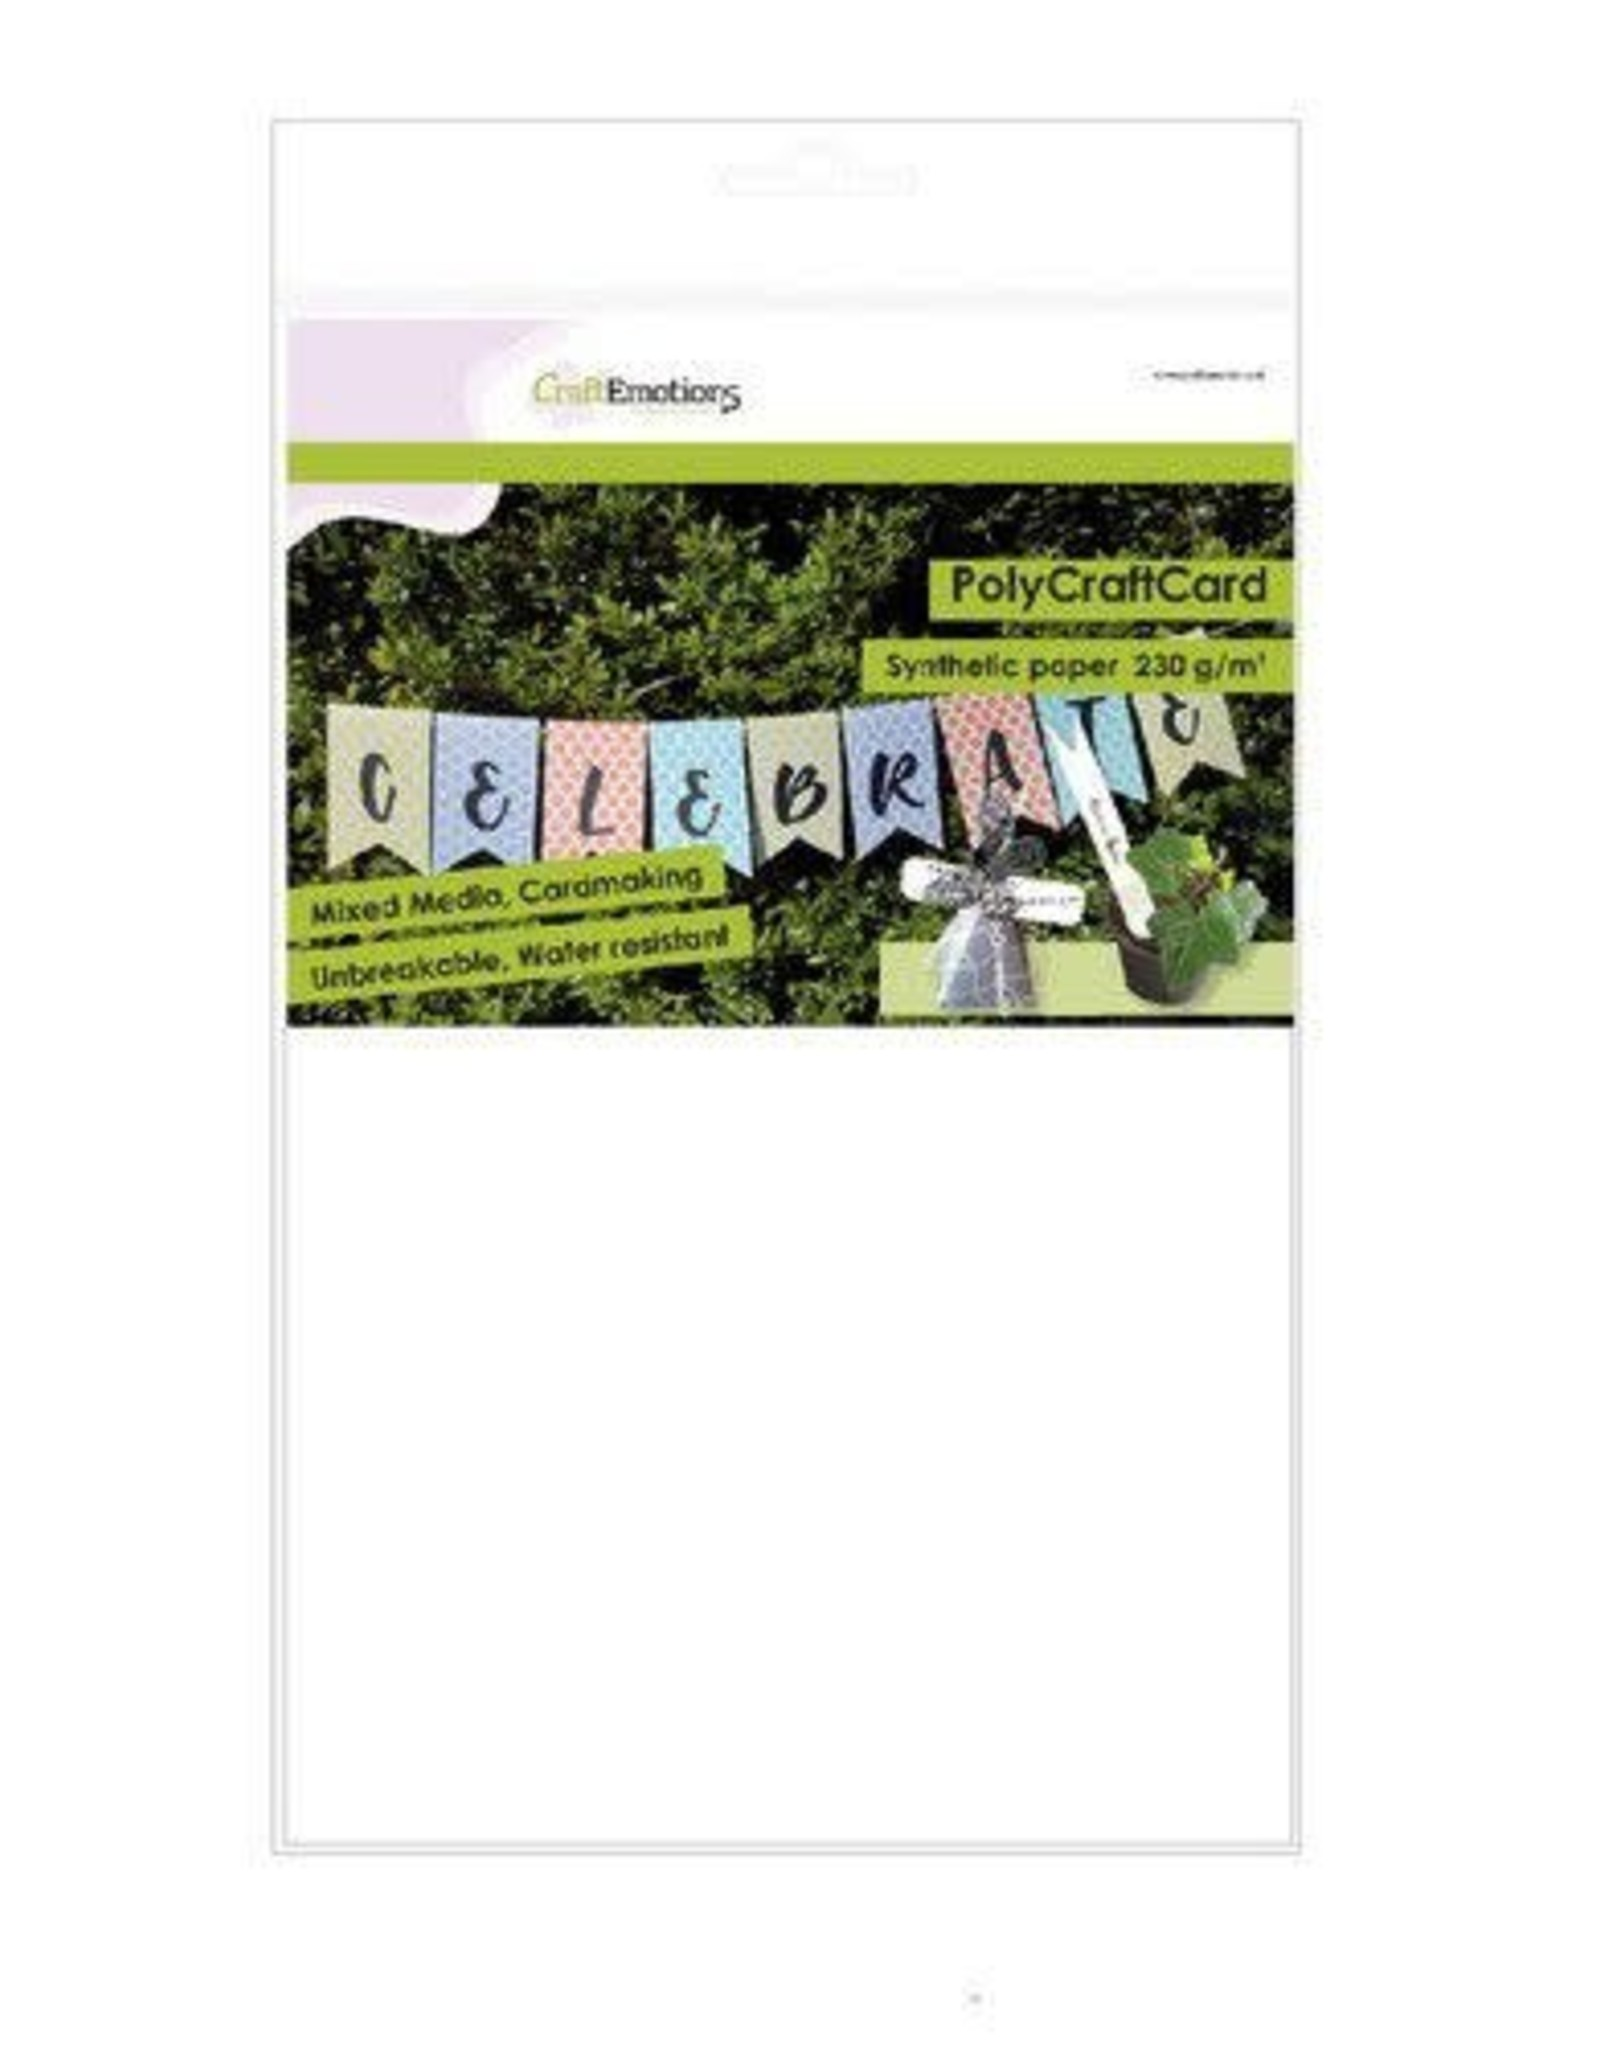 Craft Emotions CraftEmotions Synthetisch papier - PolyCraftCard wit 10 vl A4 - 230 gr